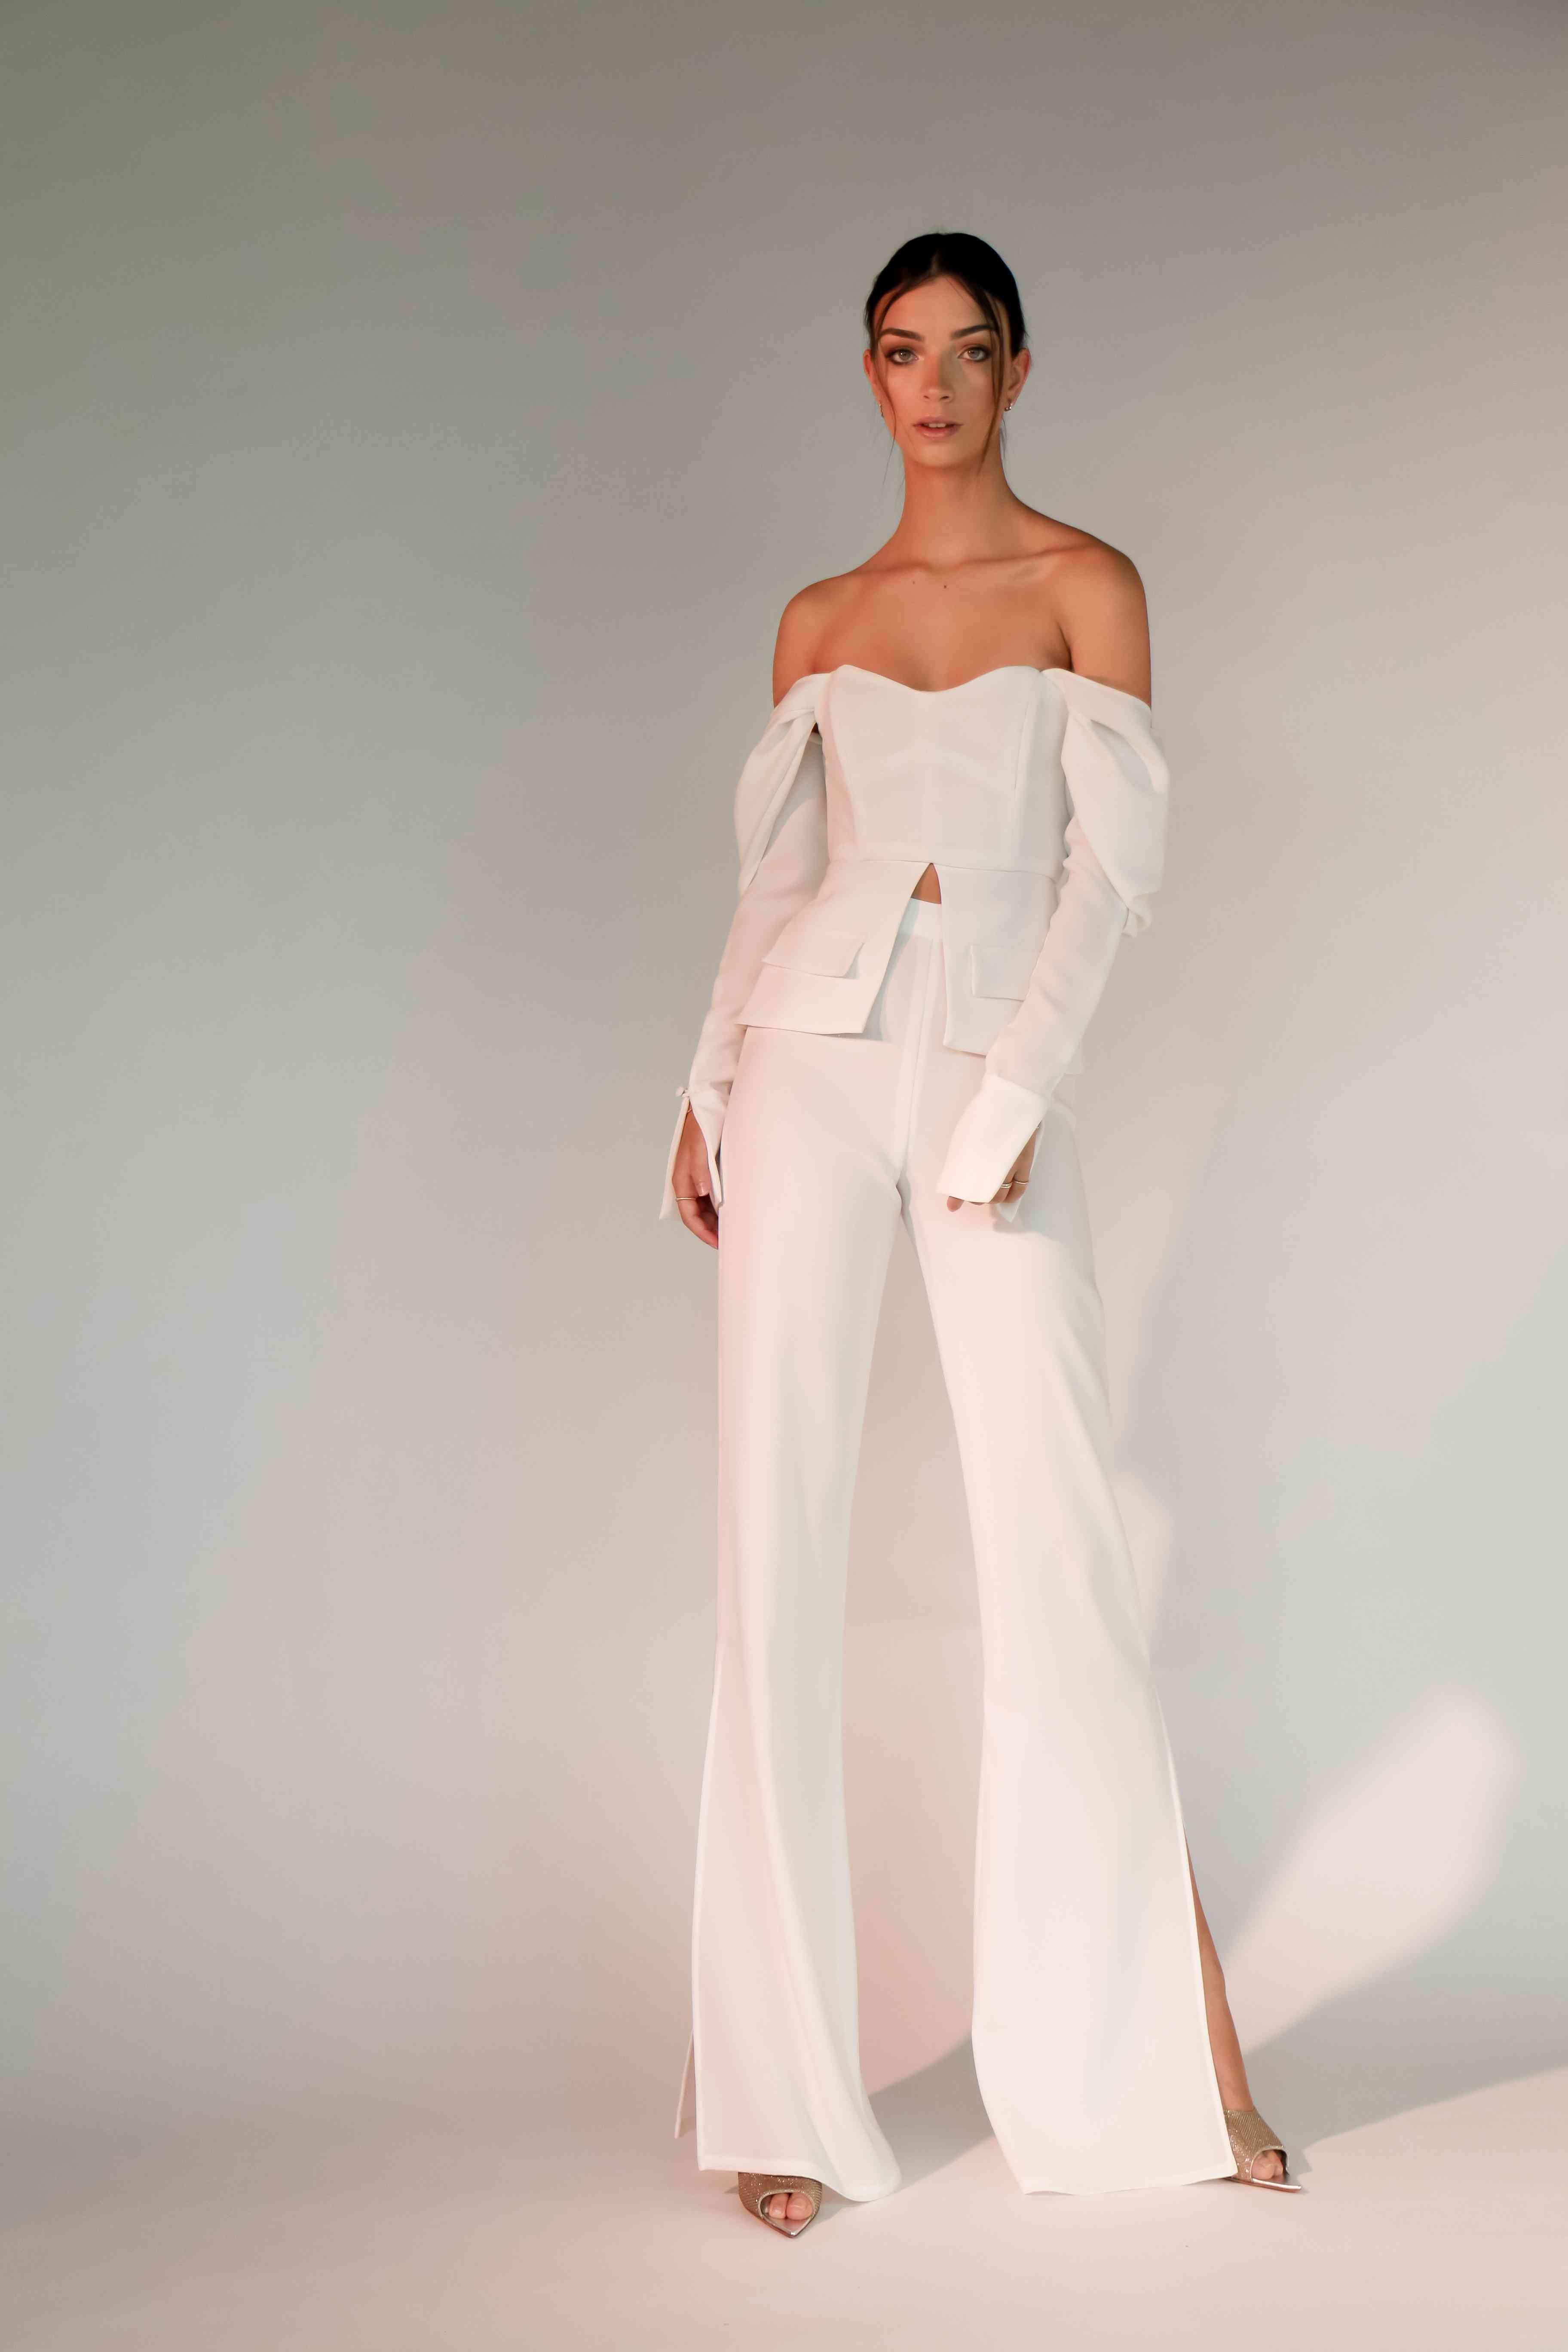 Bride wearing white suit